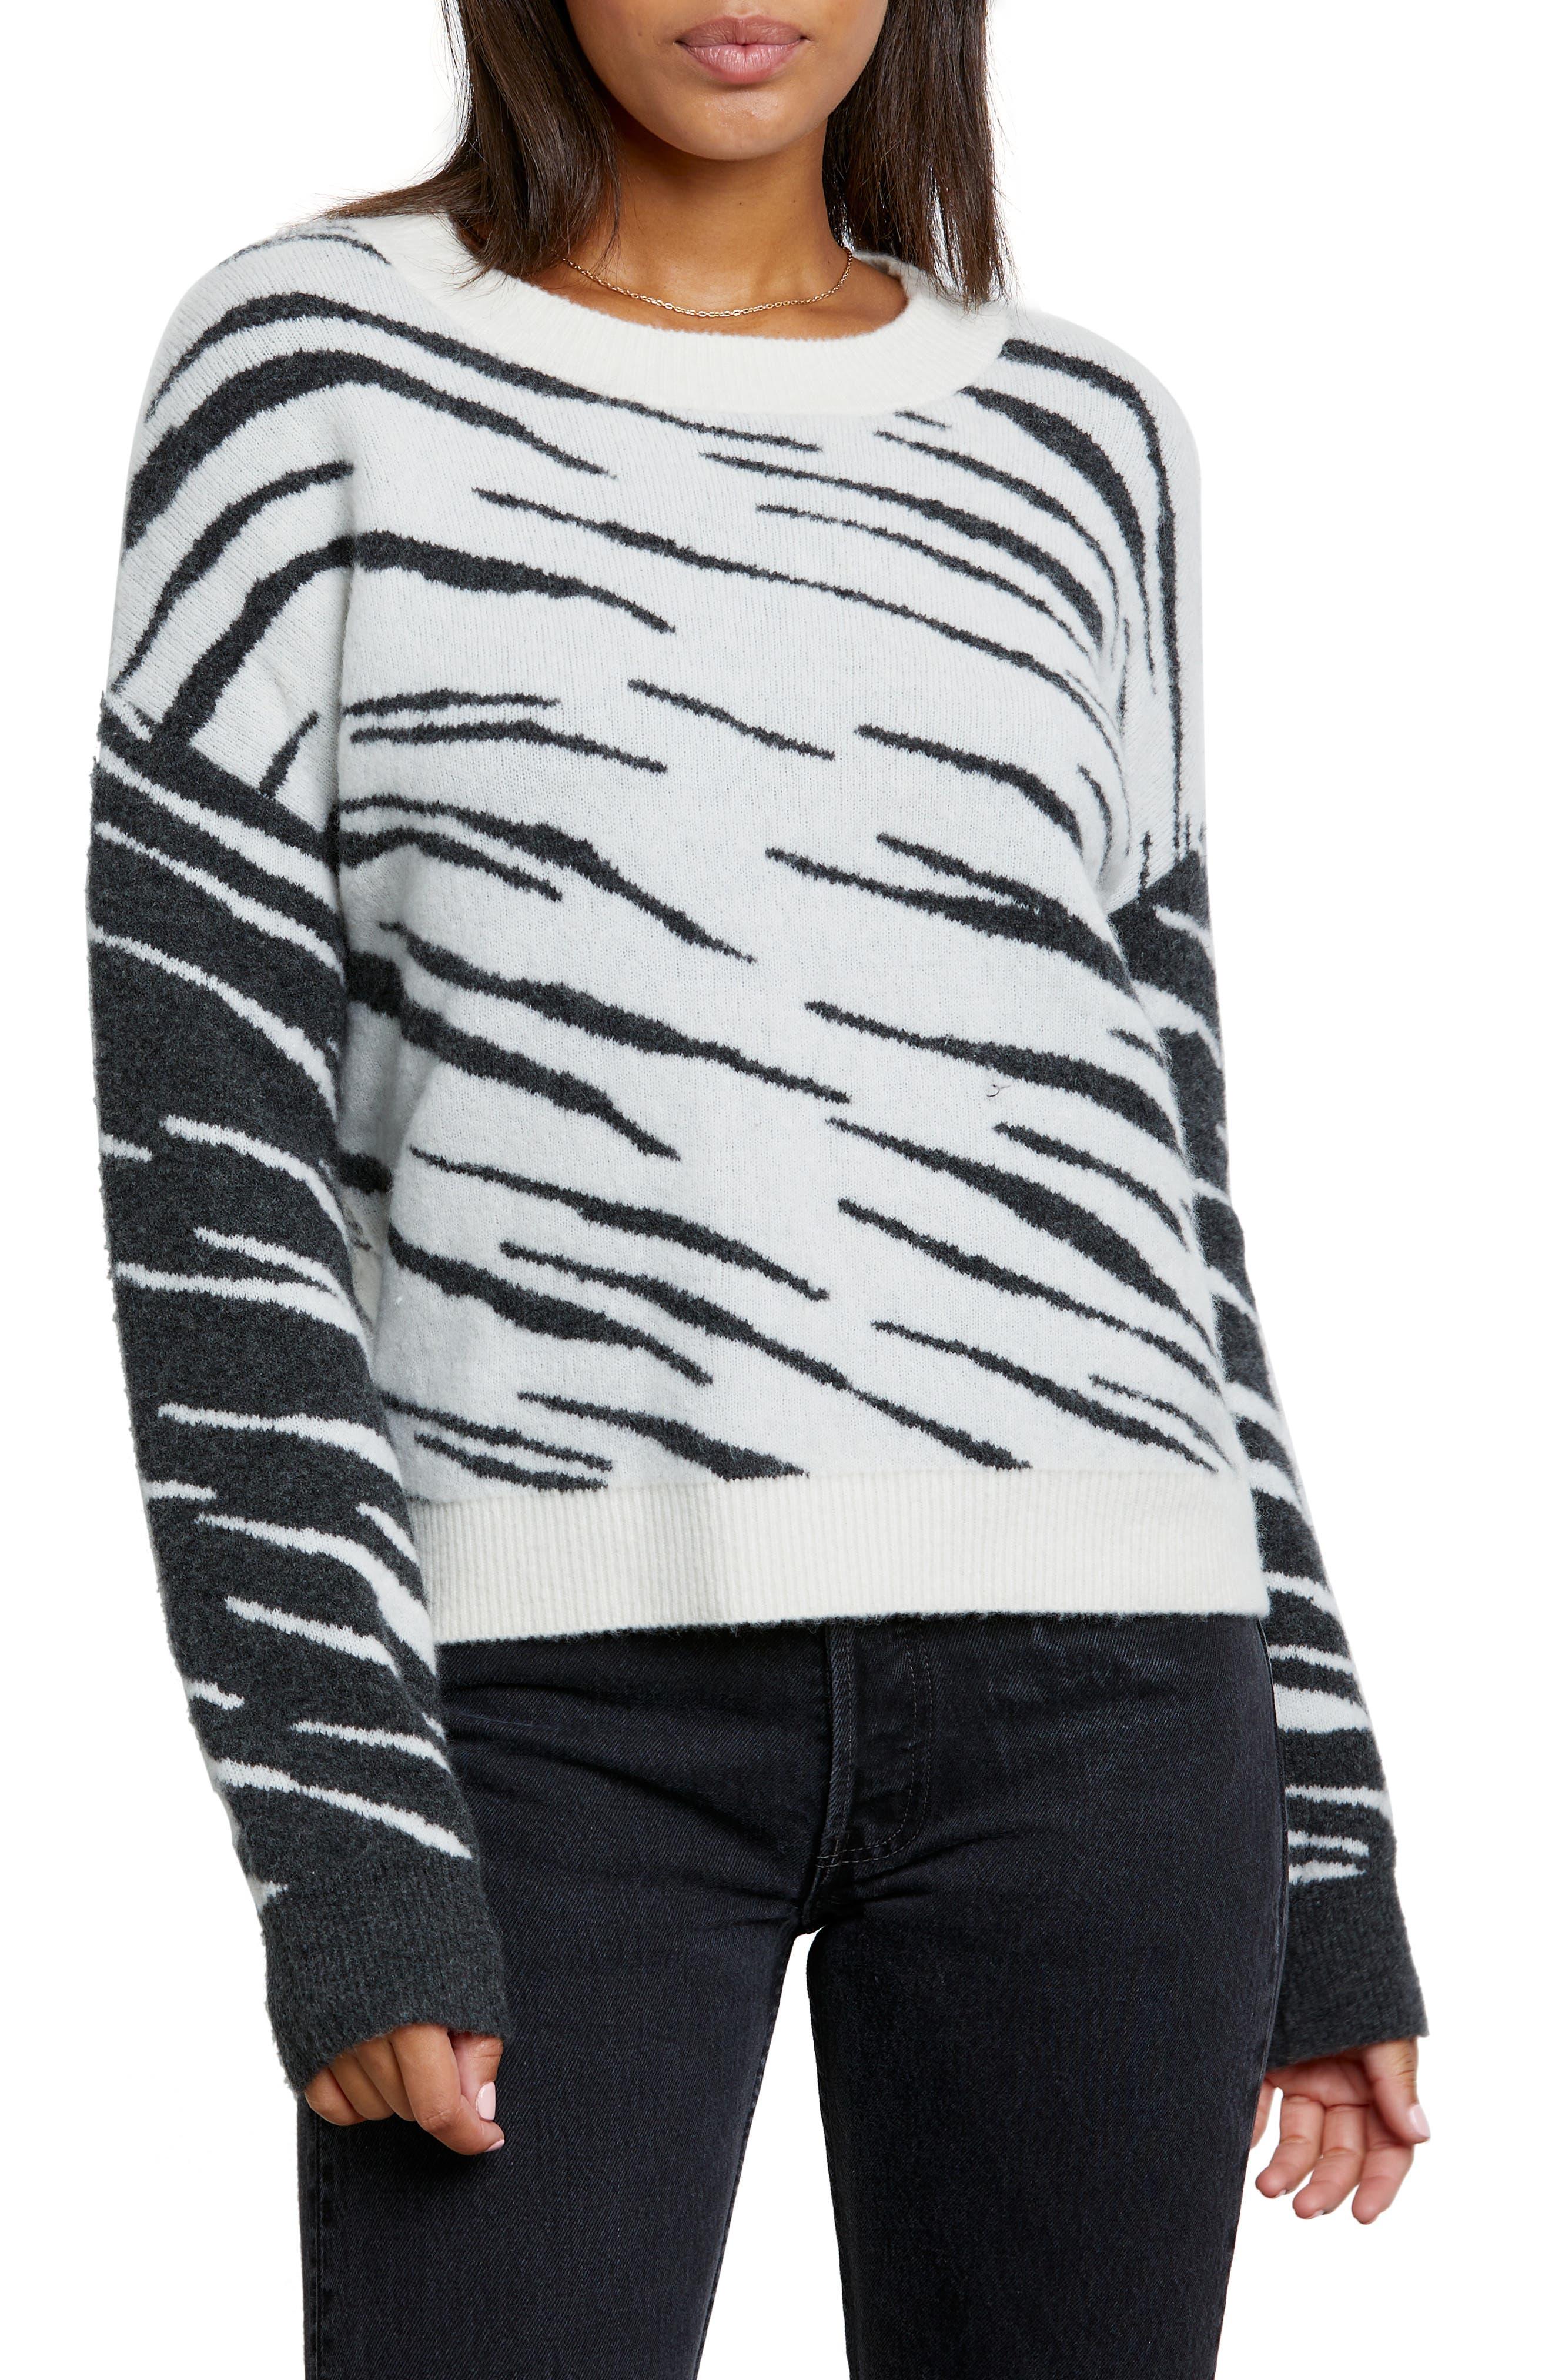 Image of Rails Lana Tiger Stripe Crewneck Sweater